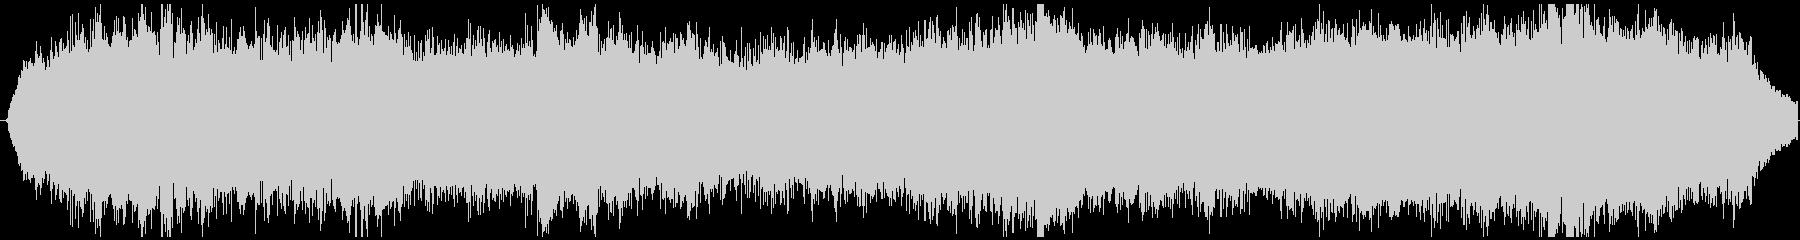 PADS スペース合唱団01の未再生の波形